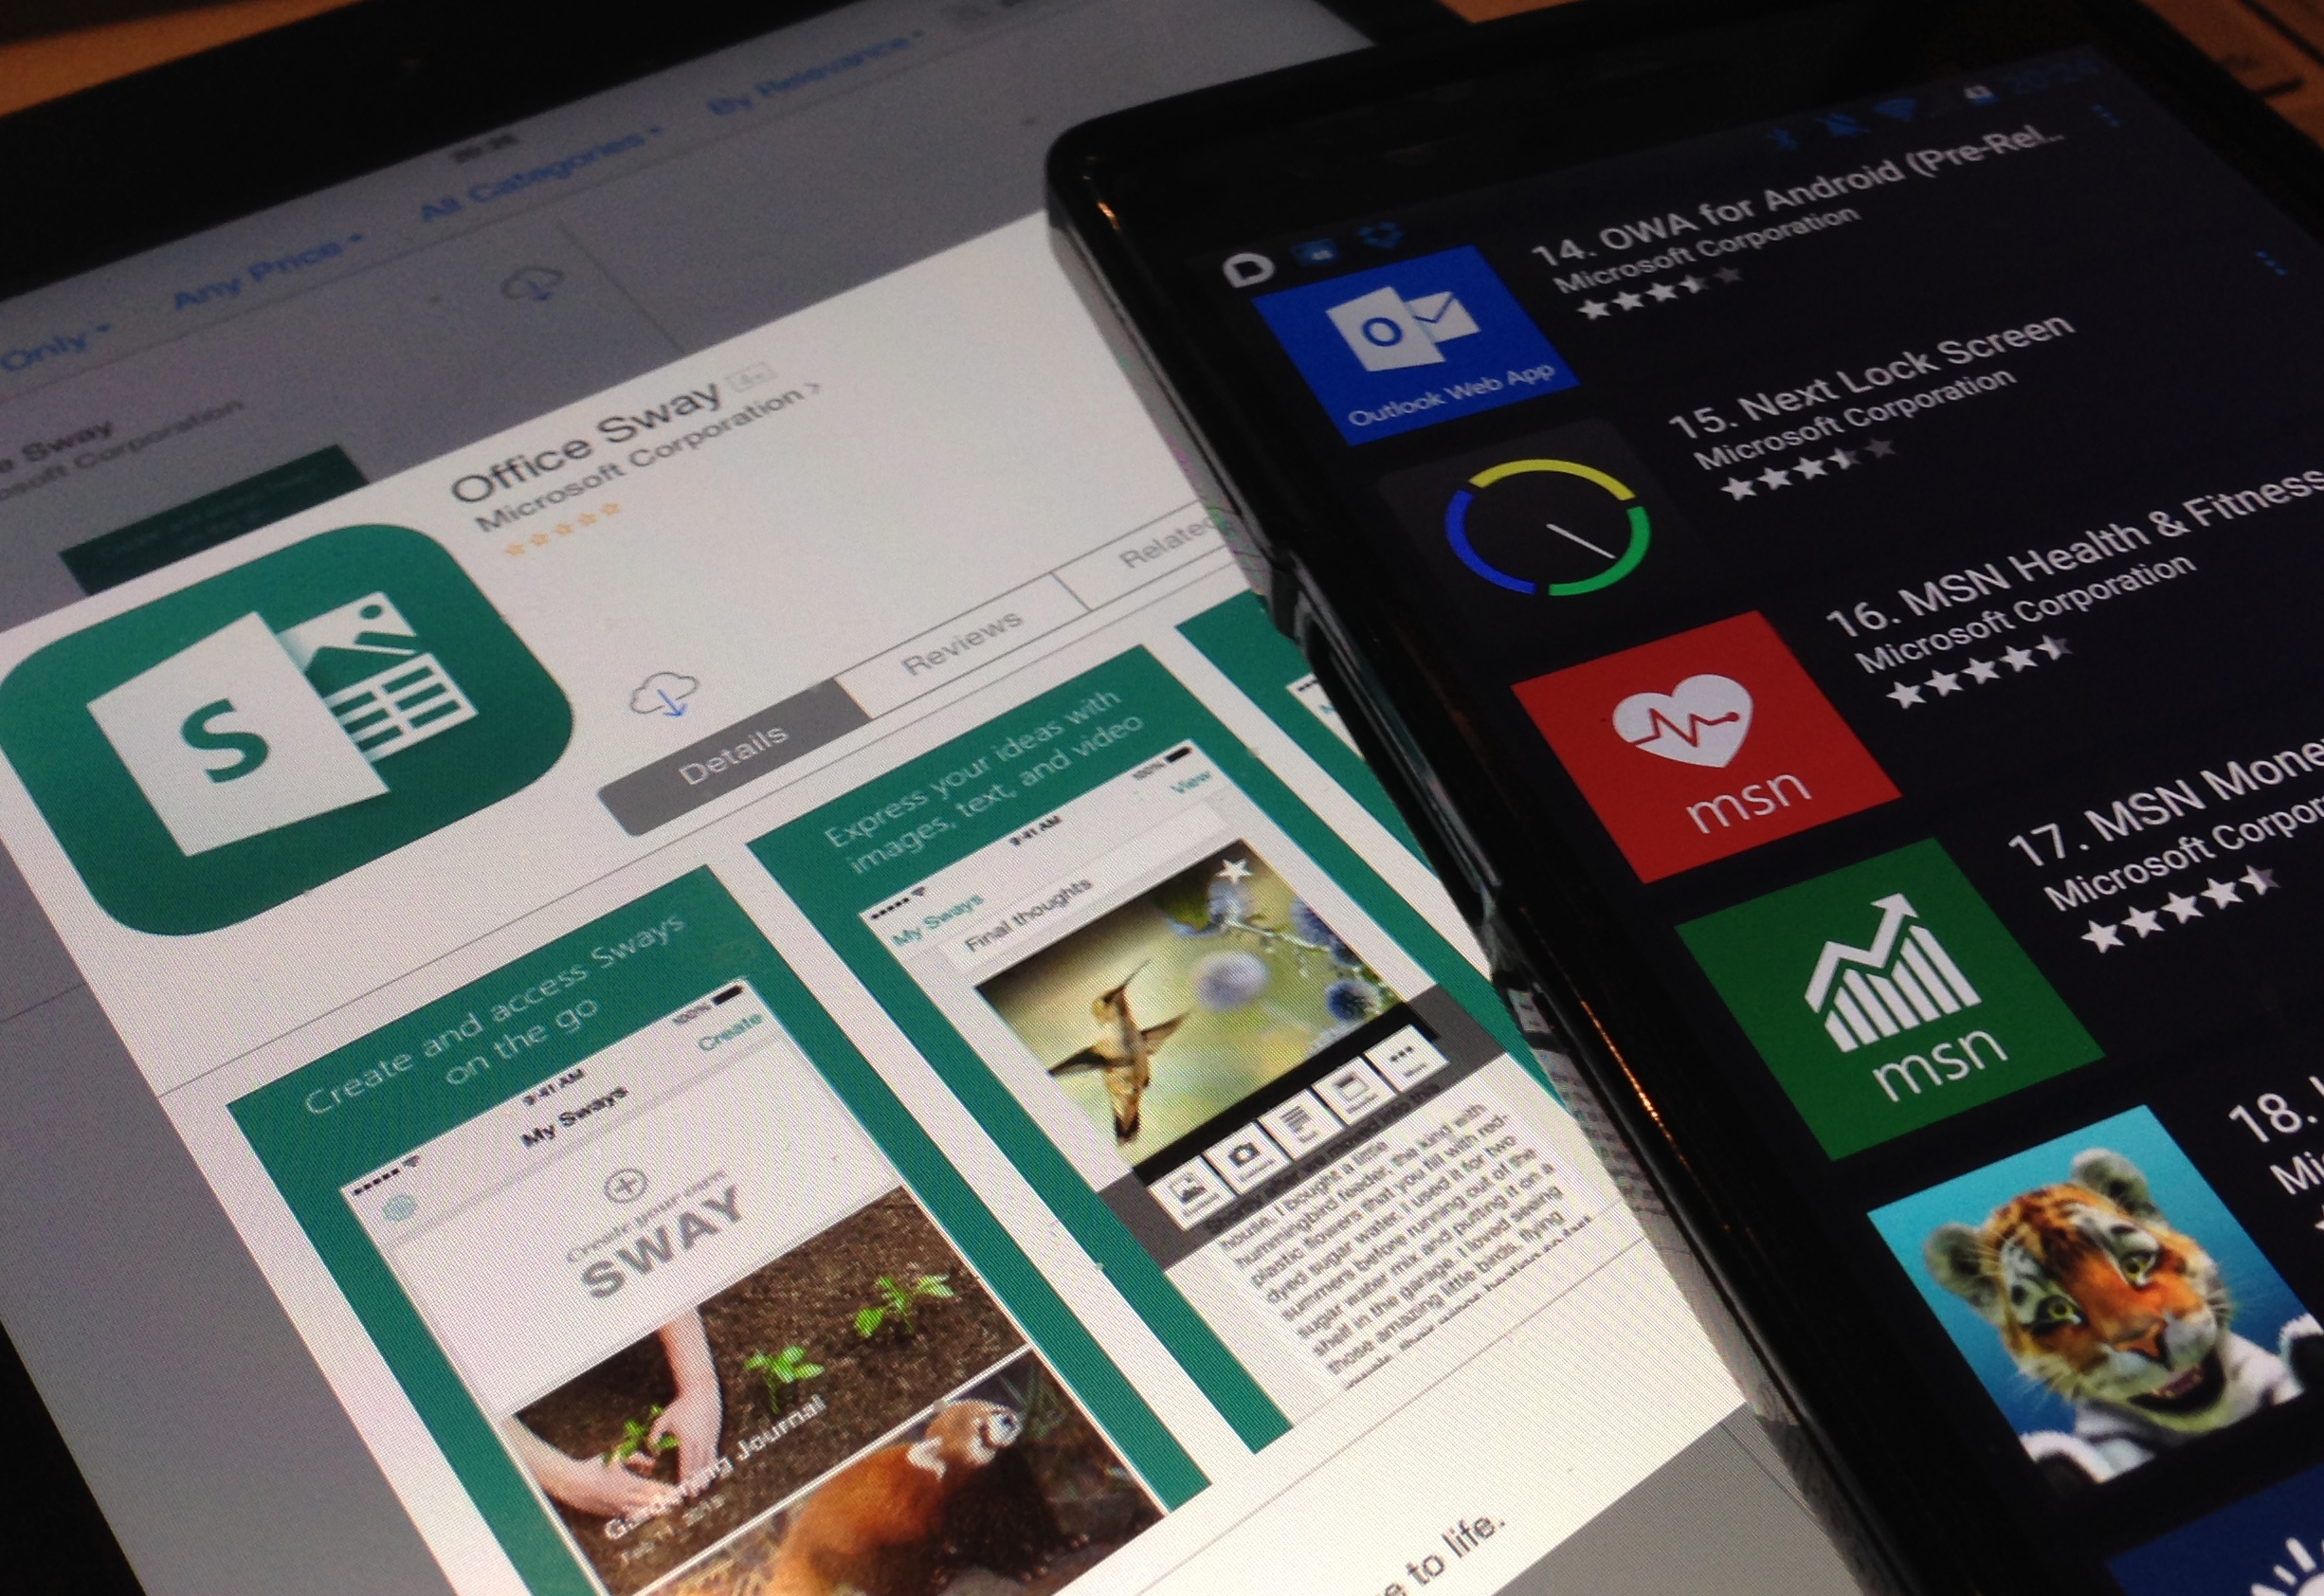 Microsoft on Mobile